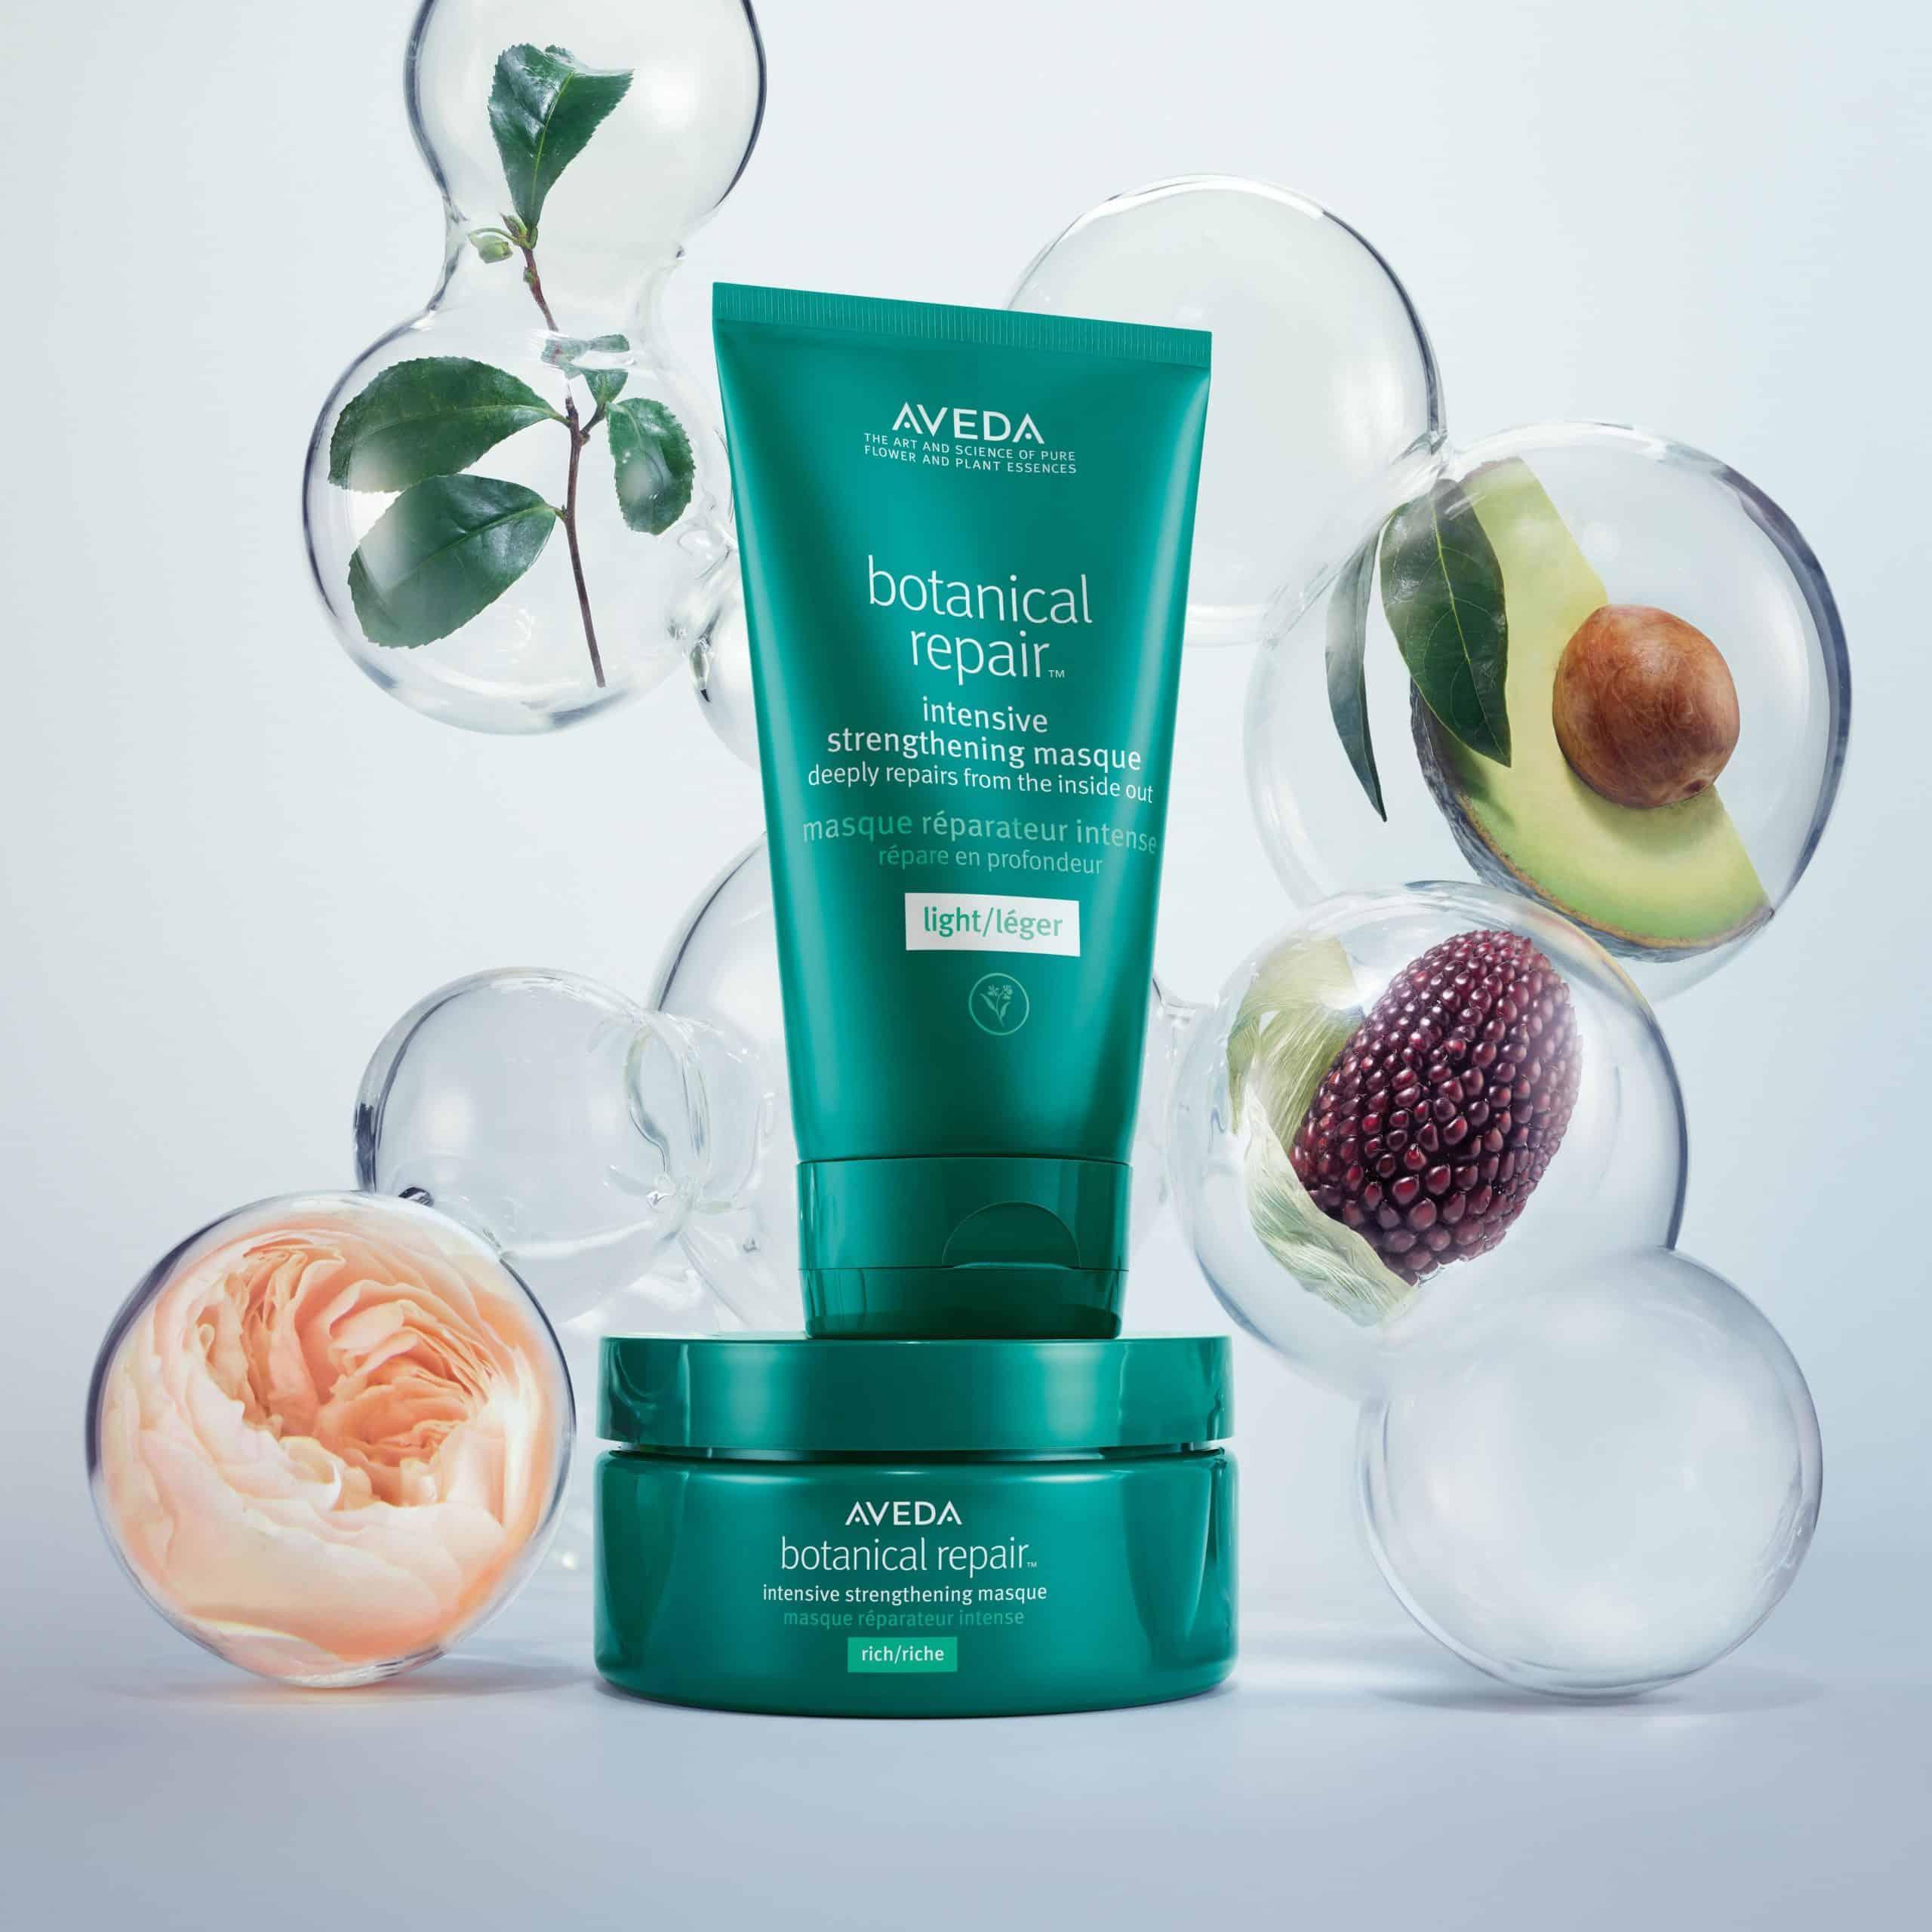 AVEDA Botanical Repair Strengthening Masque